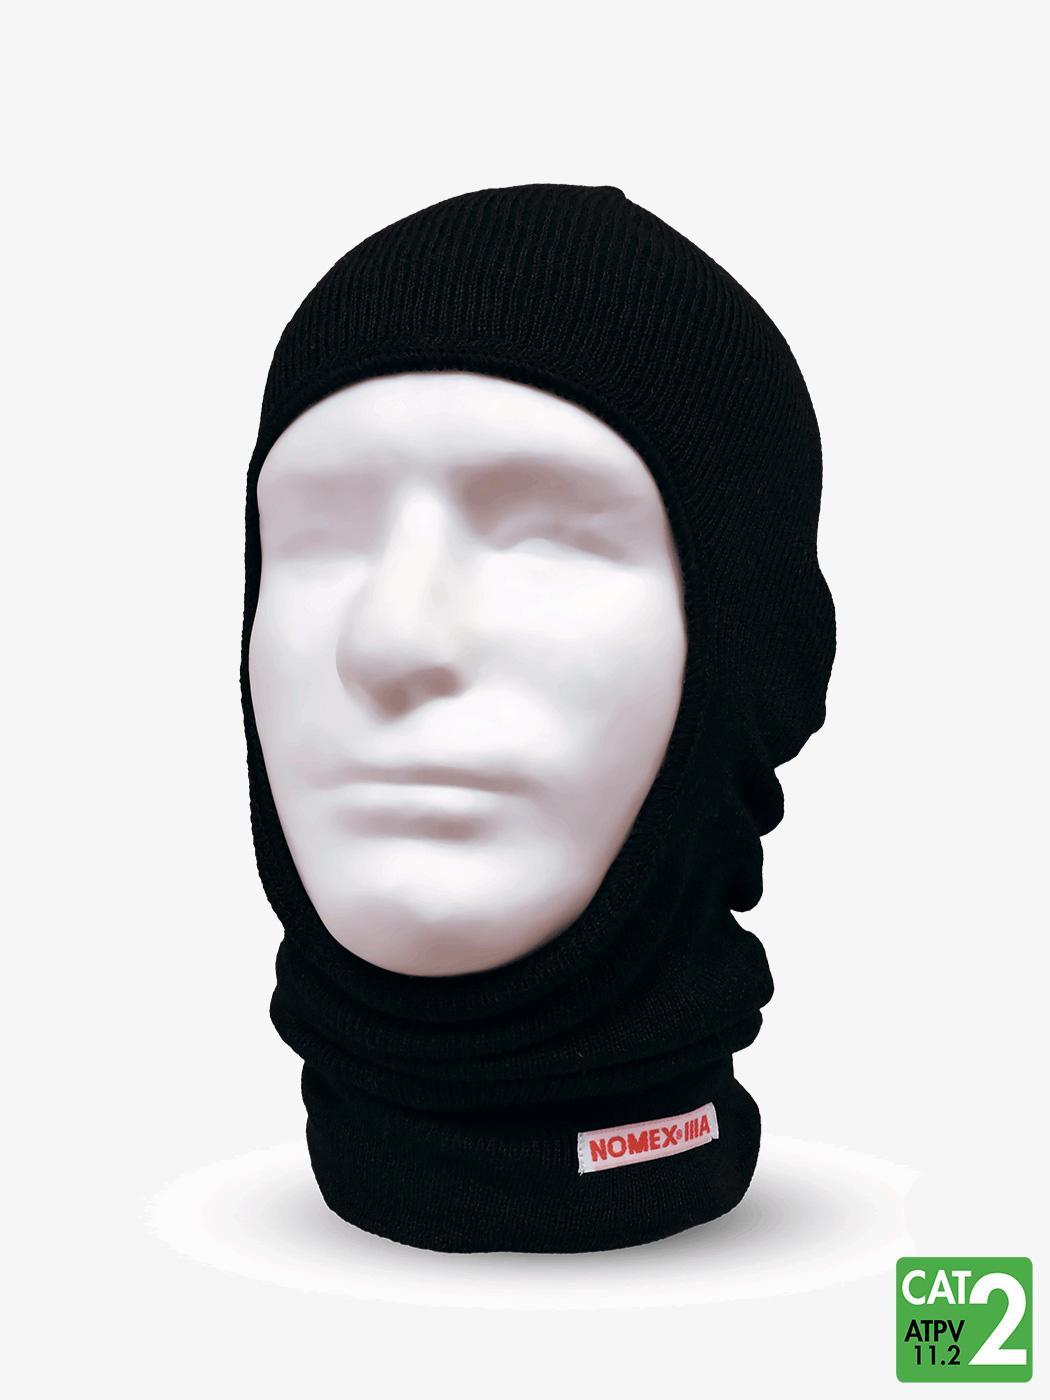 Nomex®IIIA Knit Rib Balaclava – Style J67